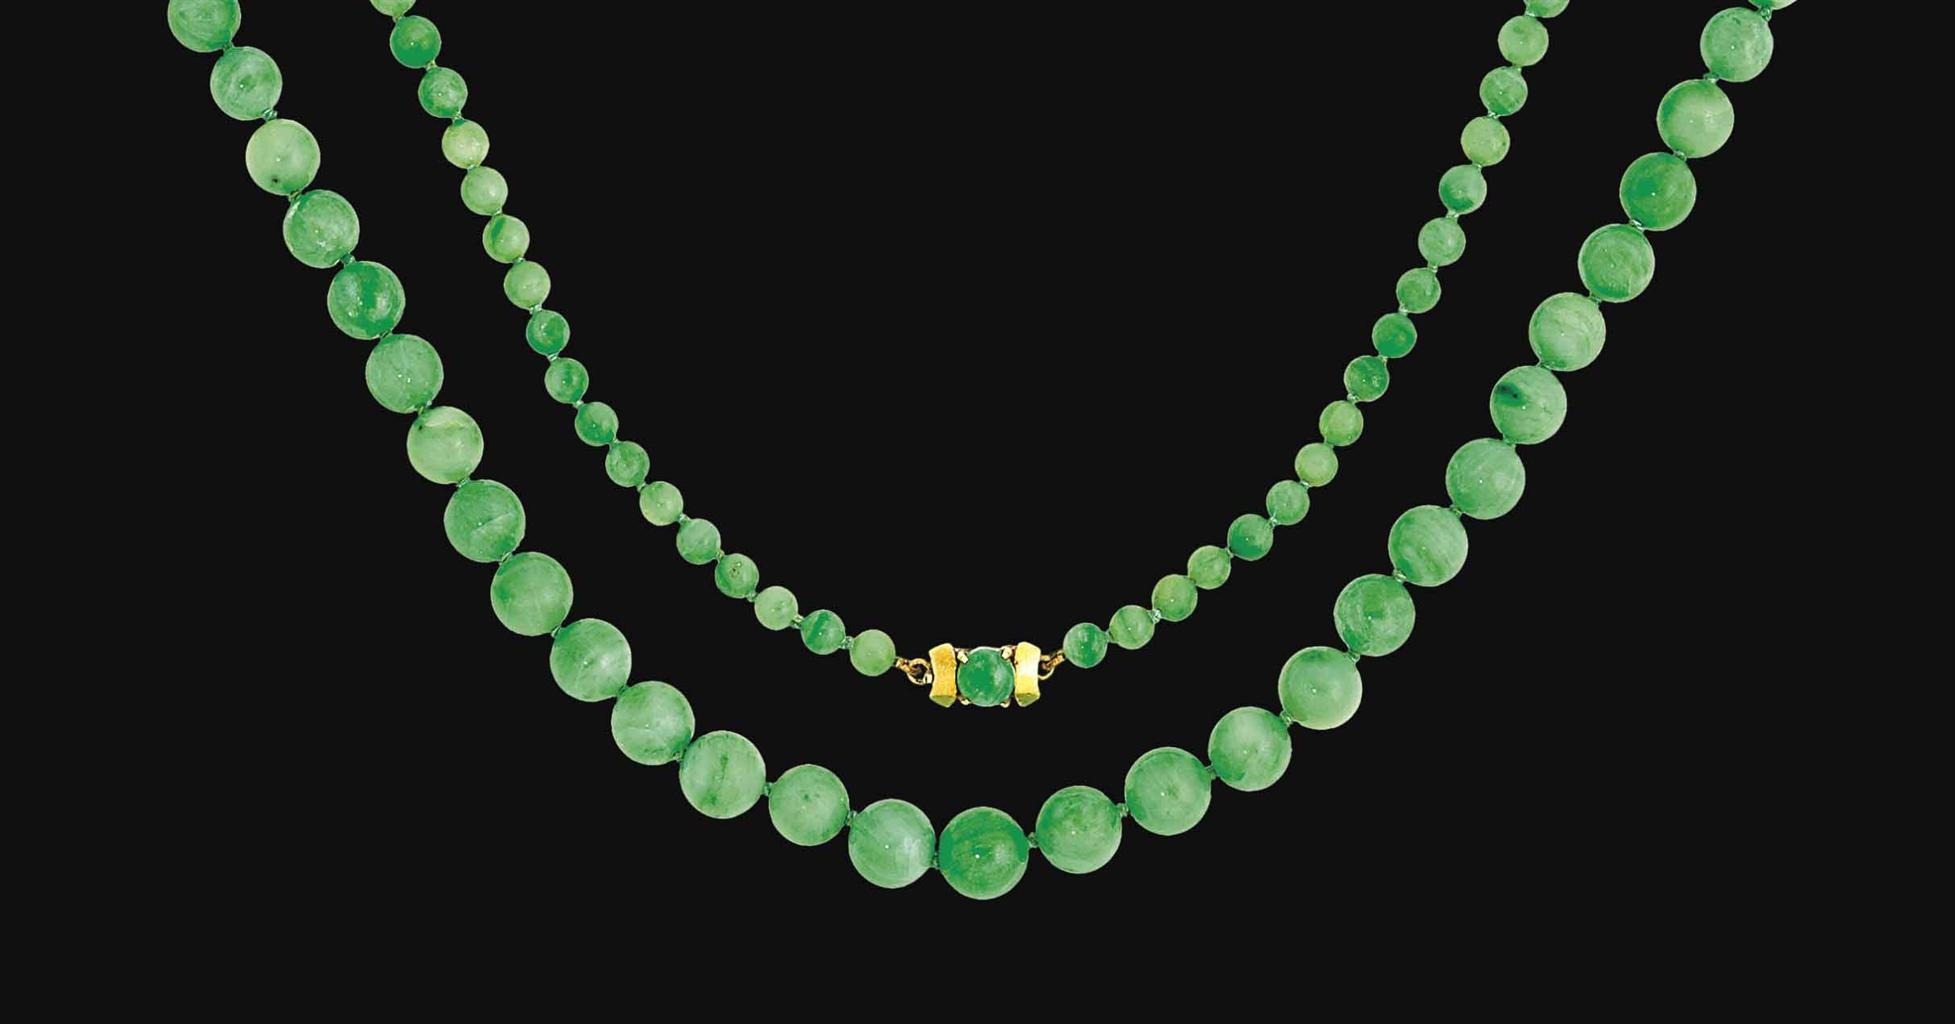 jadeite jewelry value - photo #12